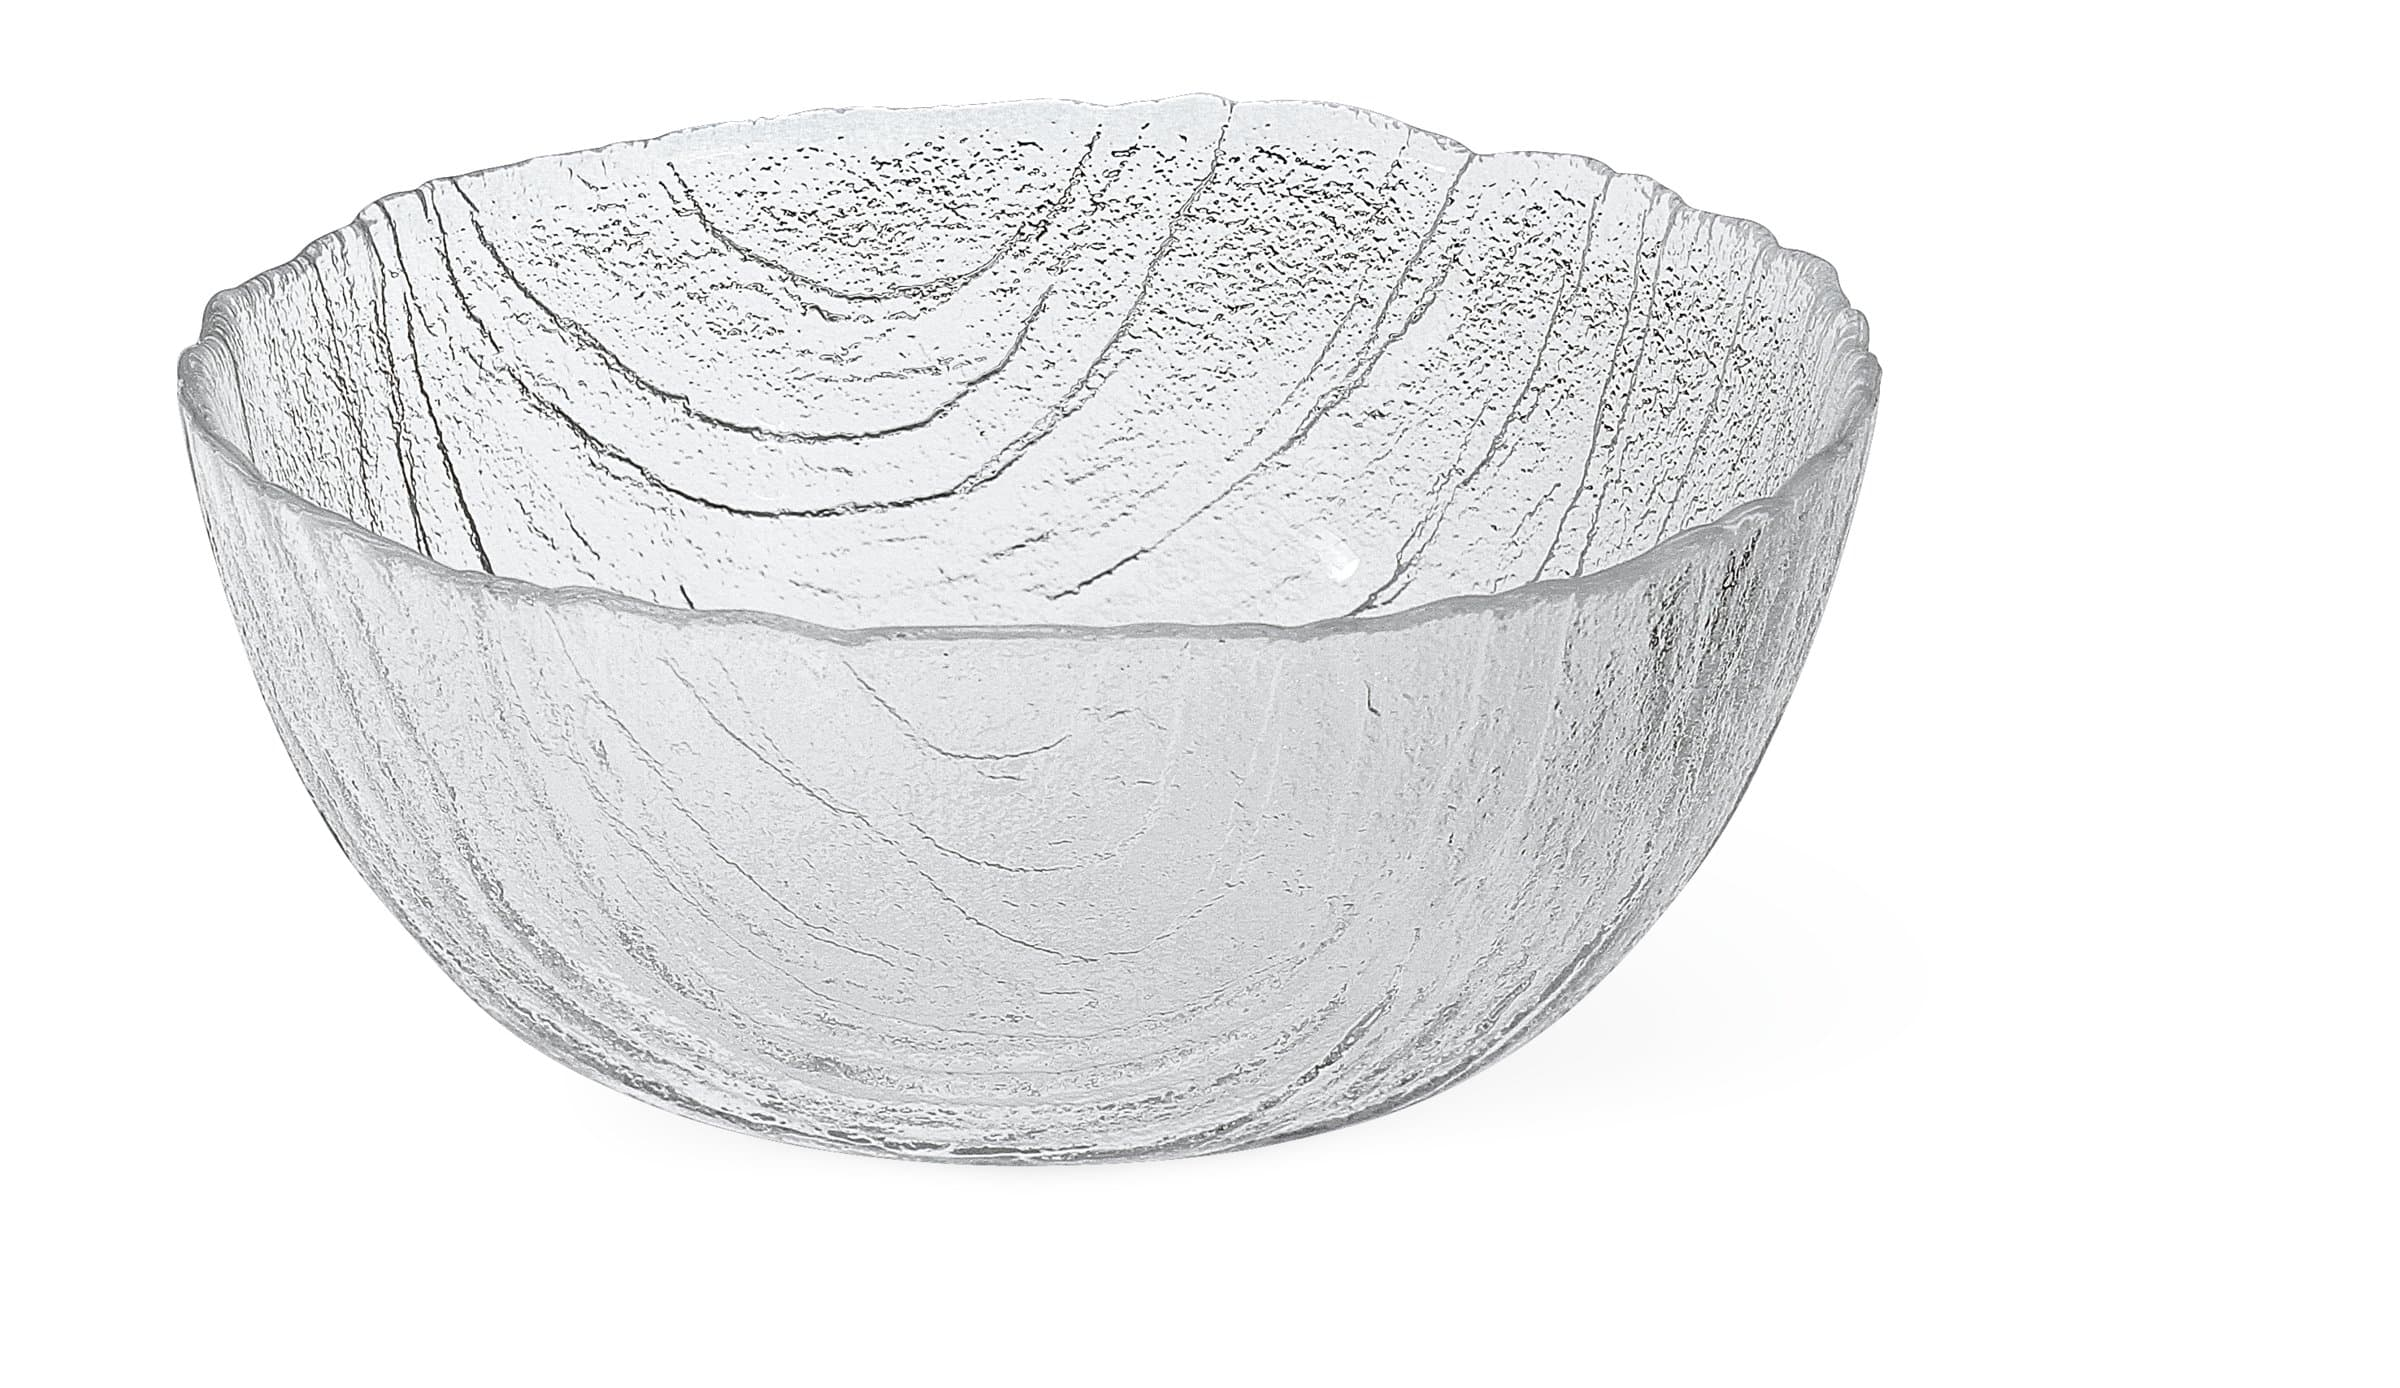 Cucina & Tavola VOLCANO Scodella 13cm